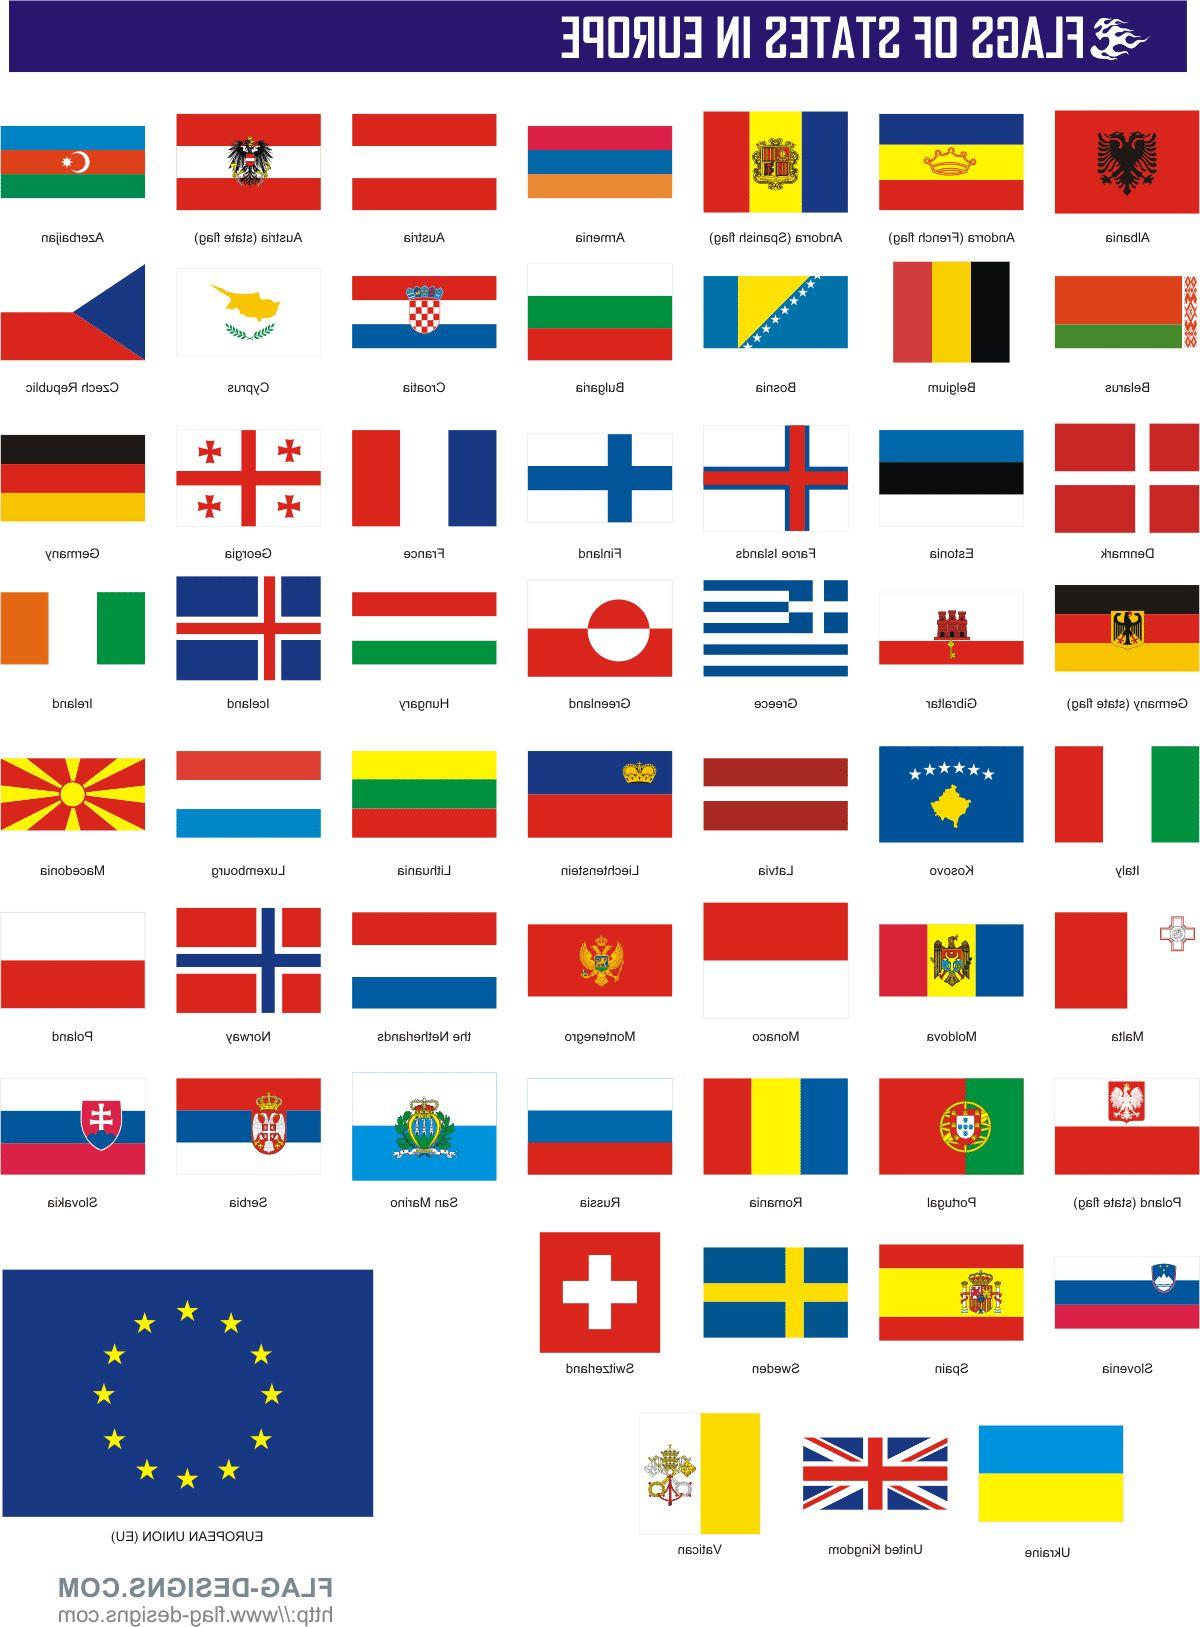 центре флаги европейских стран фото среди этнических